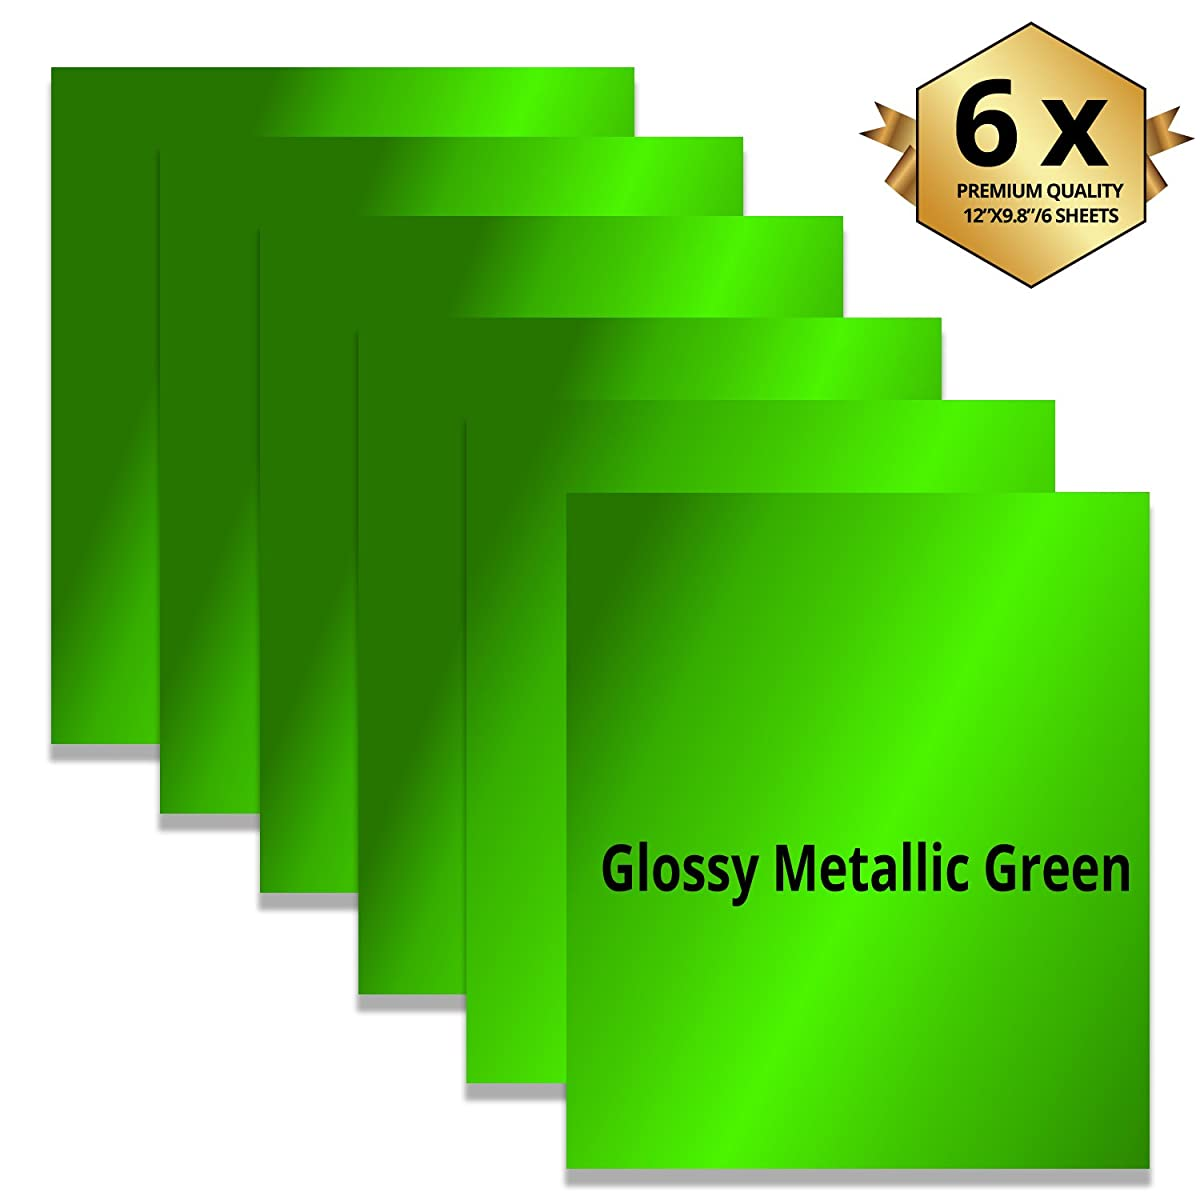 Metallic Green Foil Heat Transfer Vinyl Sheets 6 Pieces -Best Iron On HTV Vinyl for Silhouette Cameo, Heat Press & Cricut Machines